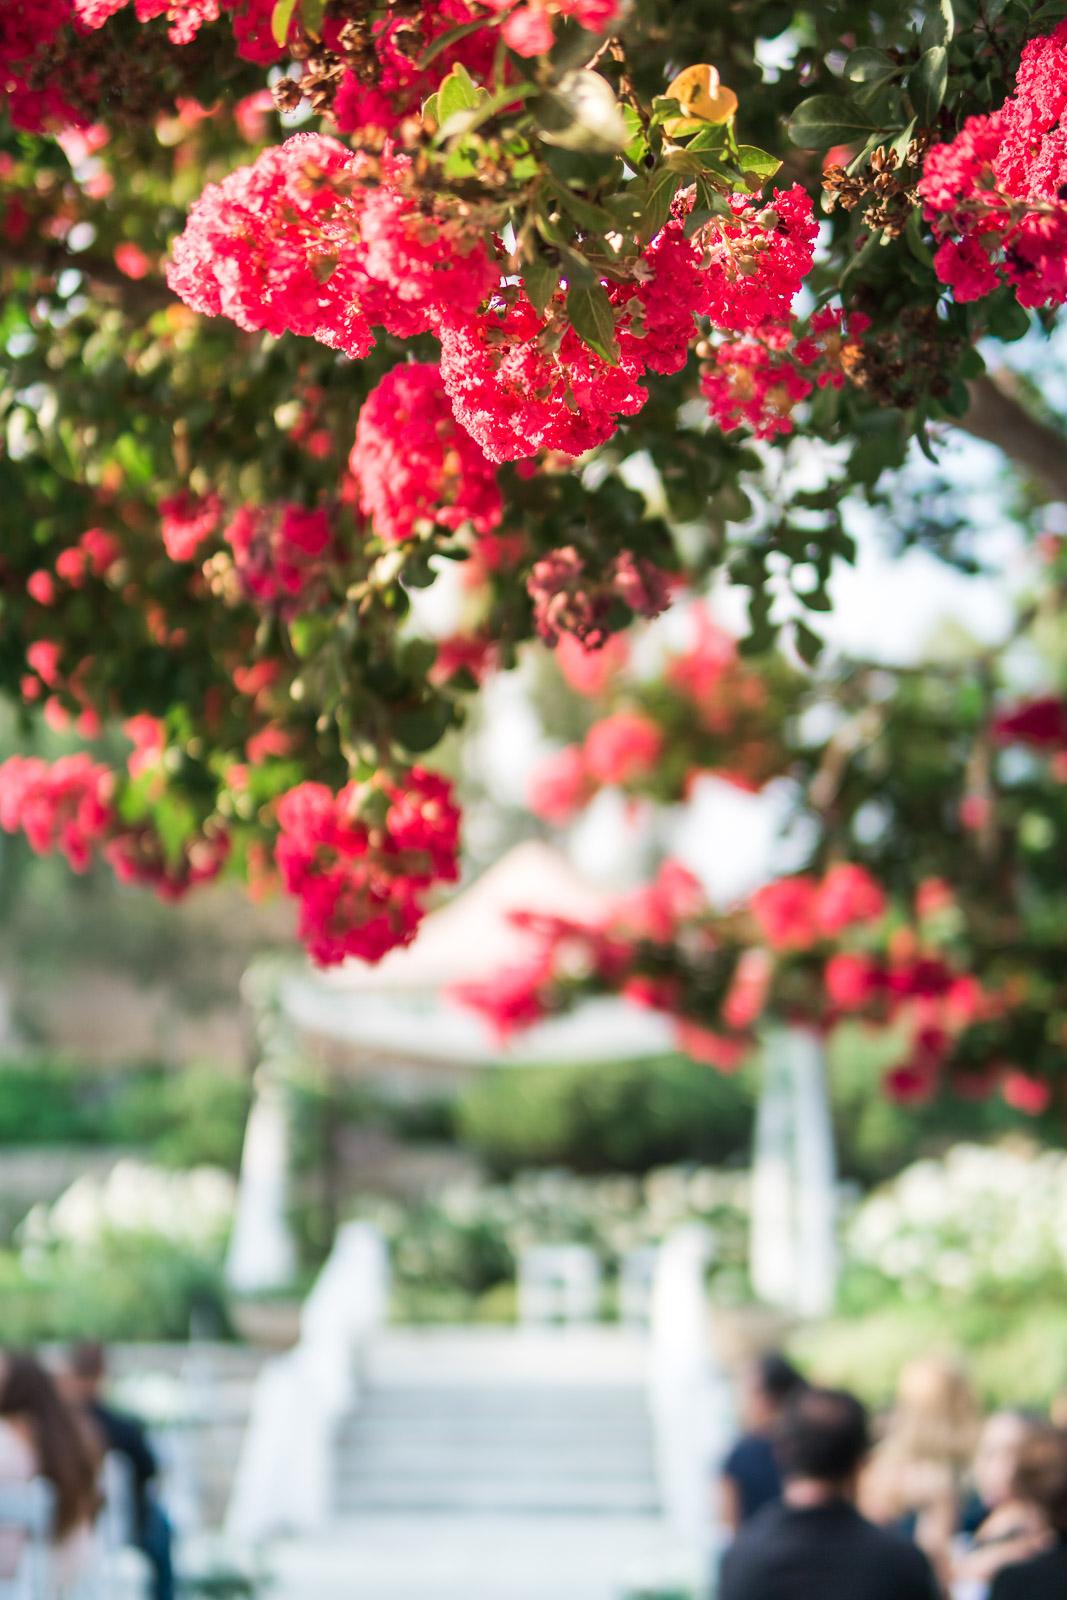 121_Angel-Brea-Orange-County_Joseph-Barber-Wedding-Photography.jpg